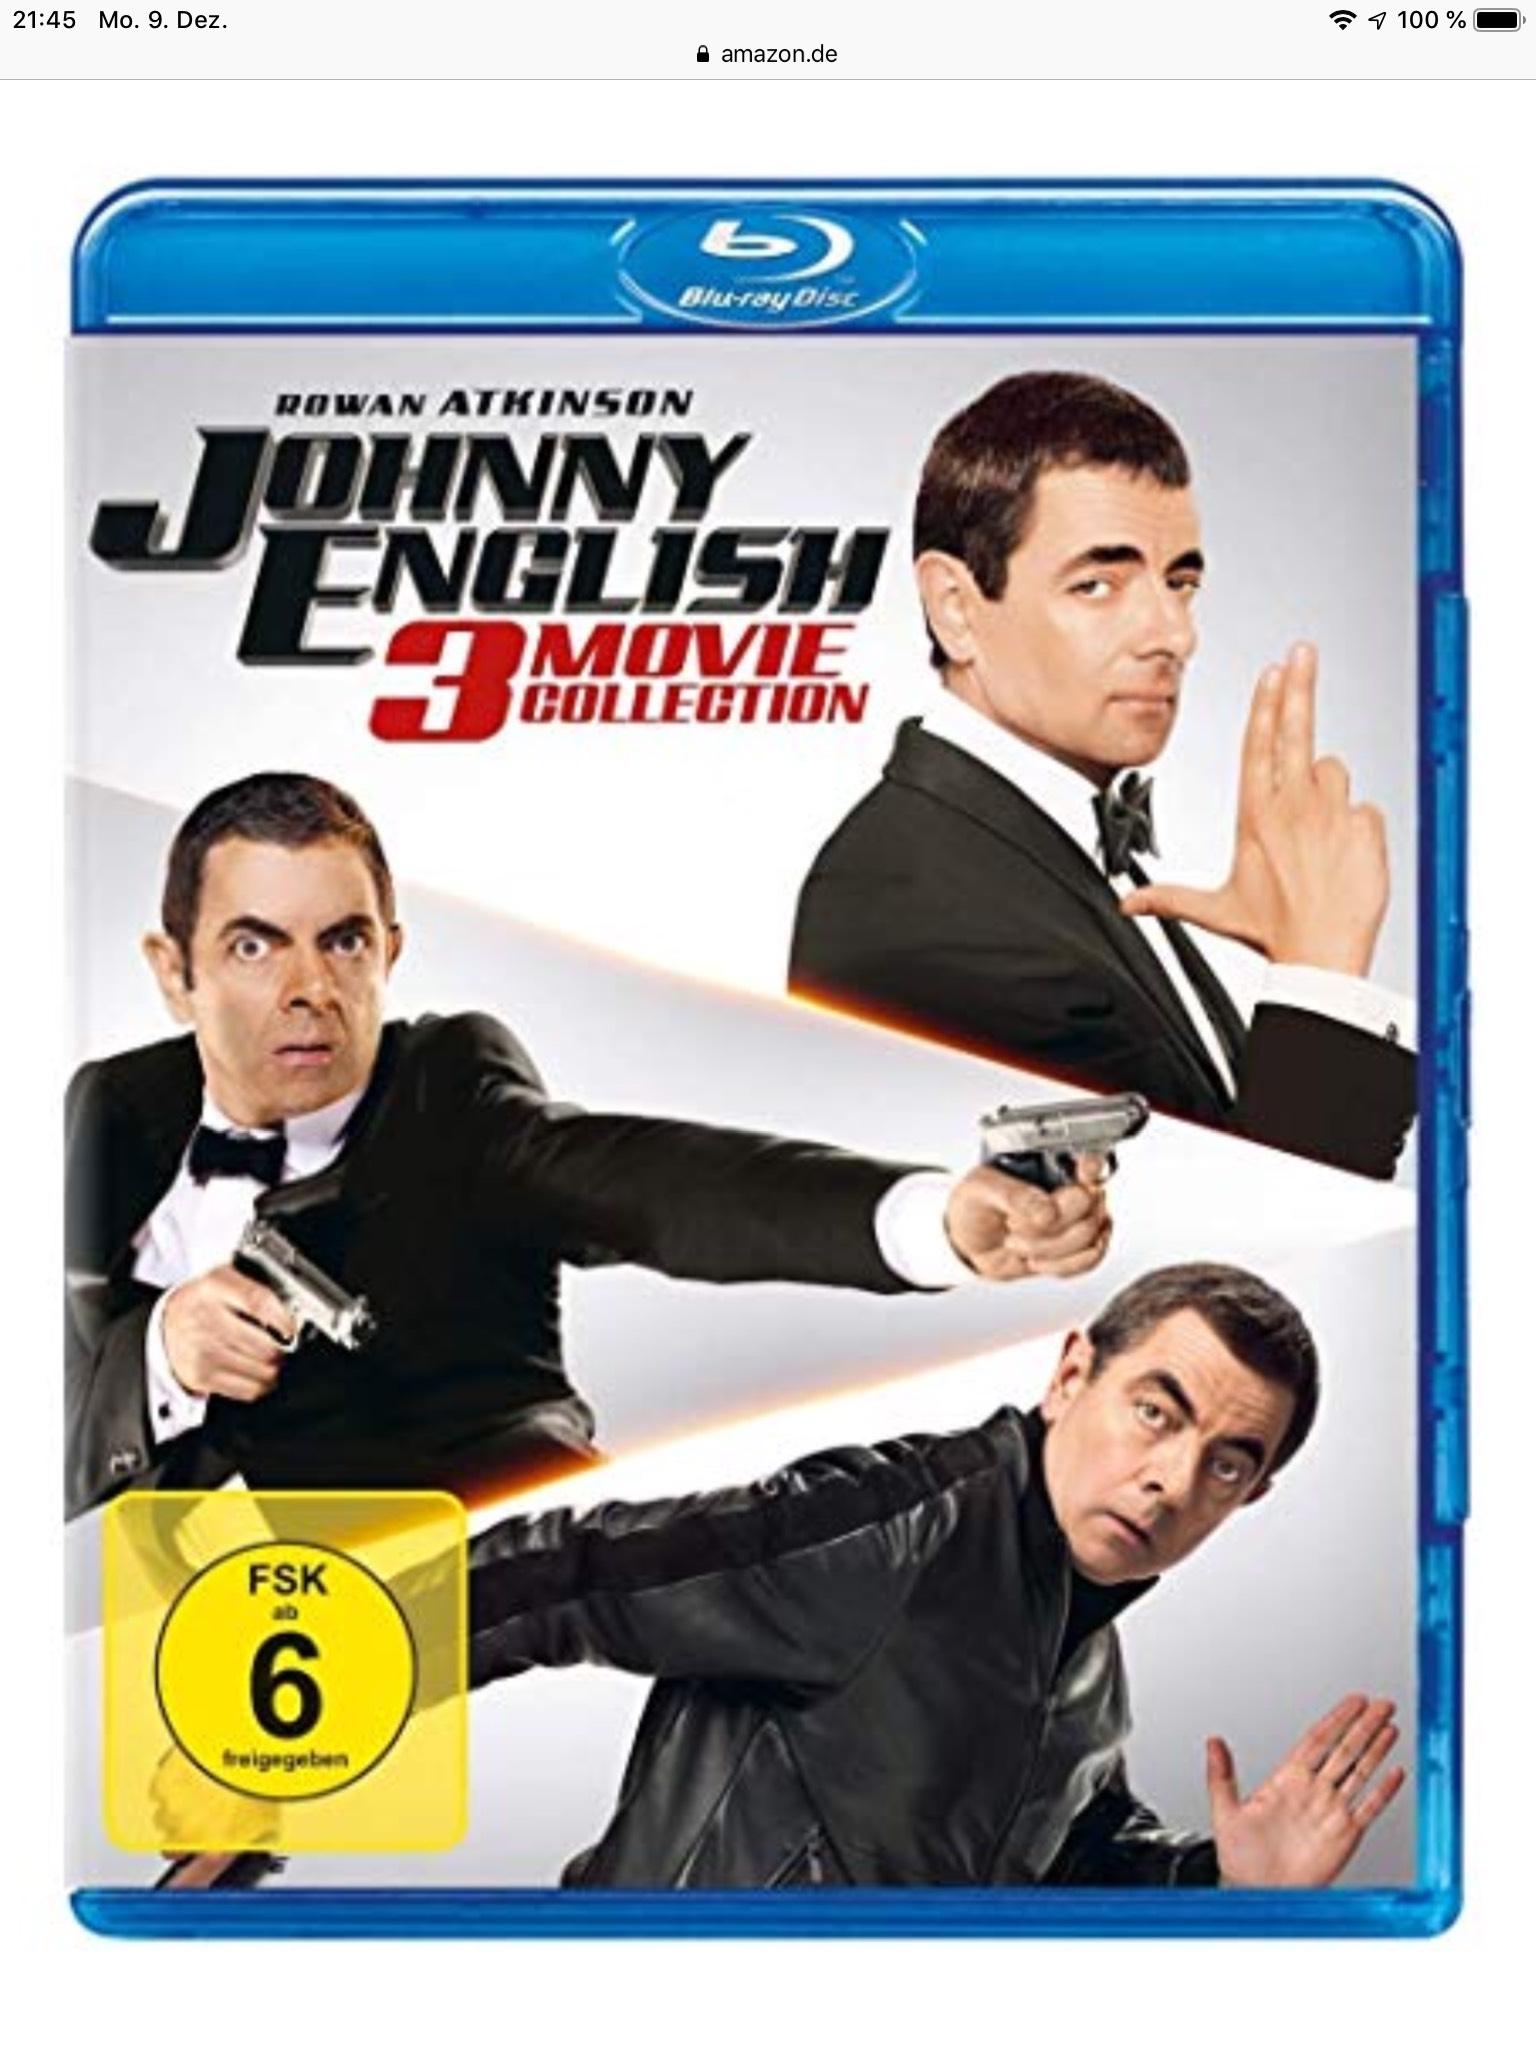 Johnny English 3-Movie Blu-ray